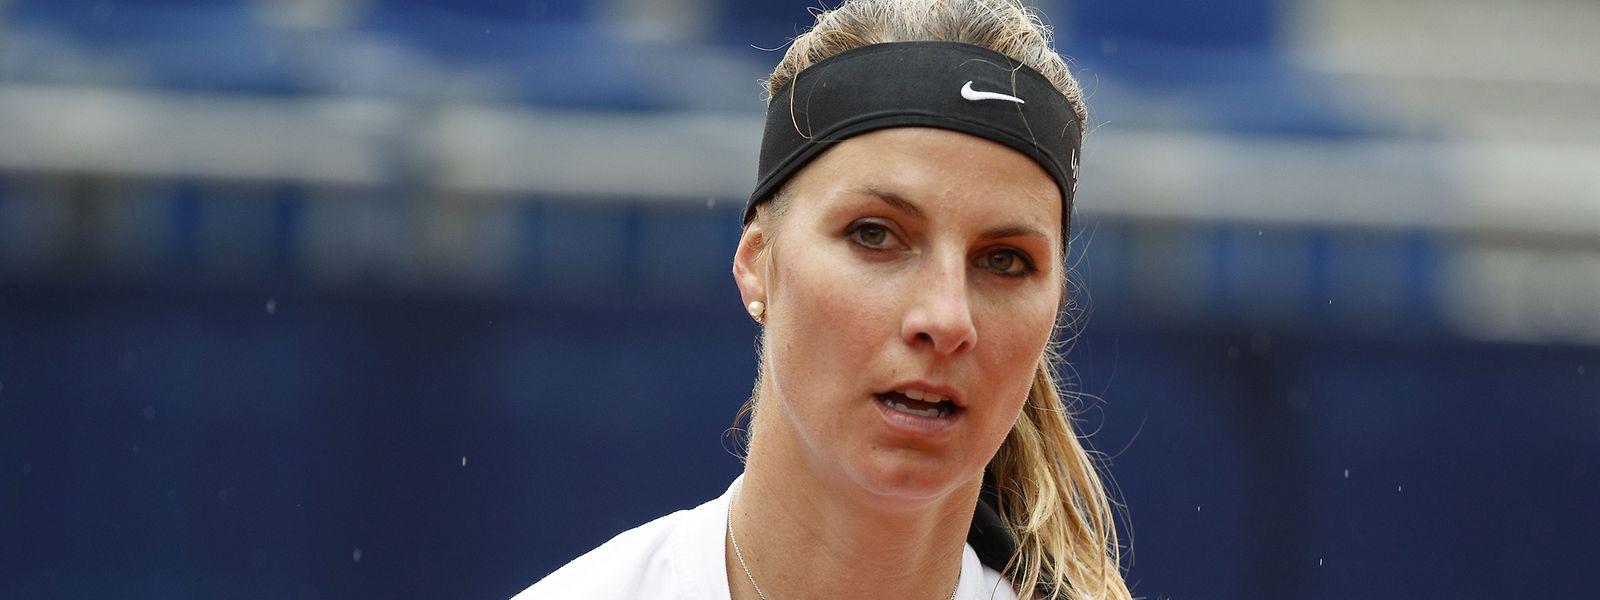 Mandy Minella a d'abord surpris Katerina Siniakova avant de reconnaître la supériorité de sa cadette.